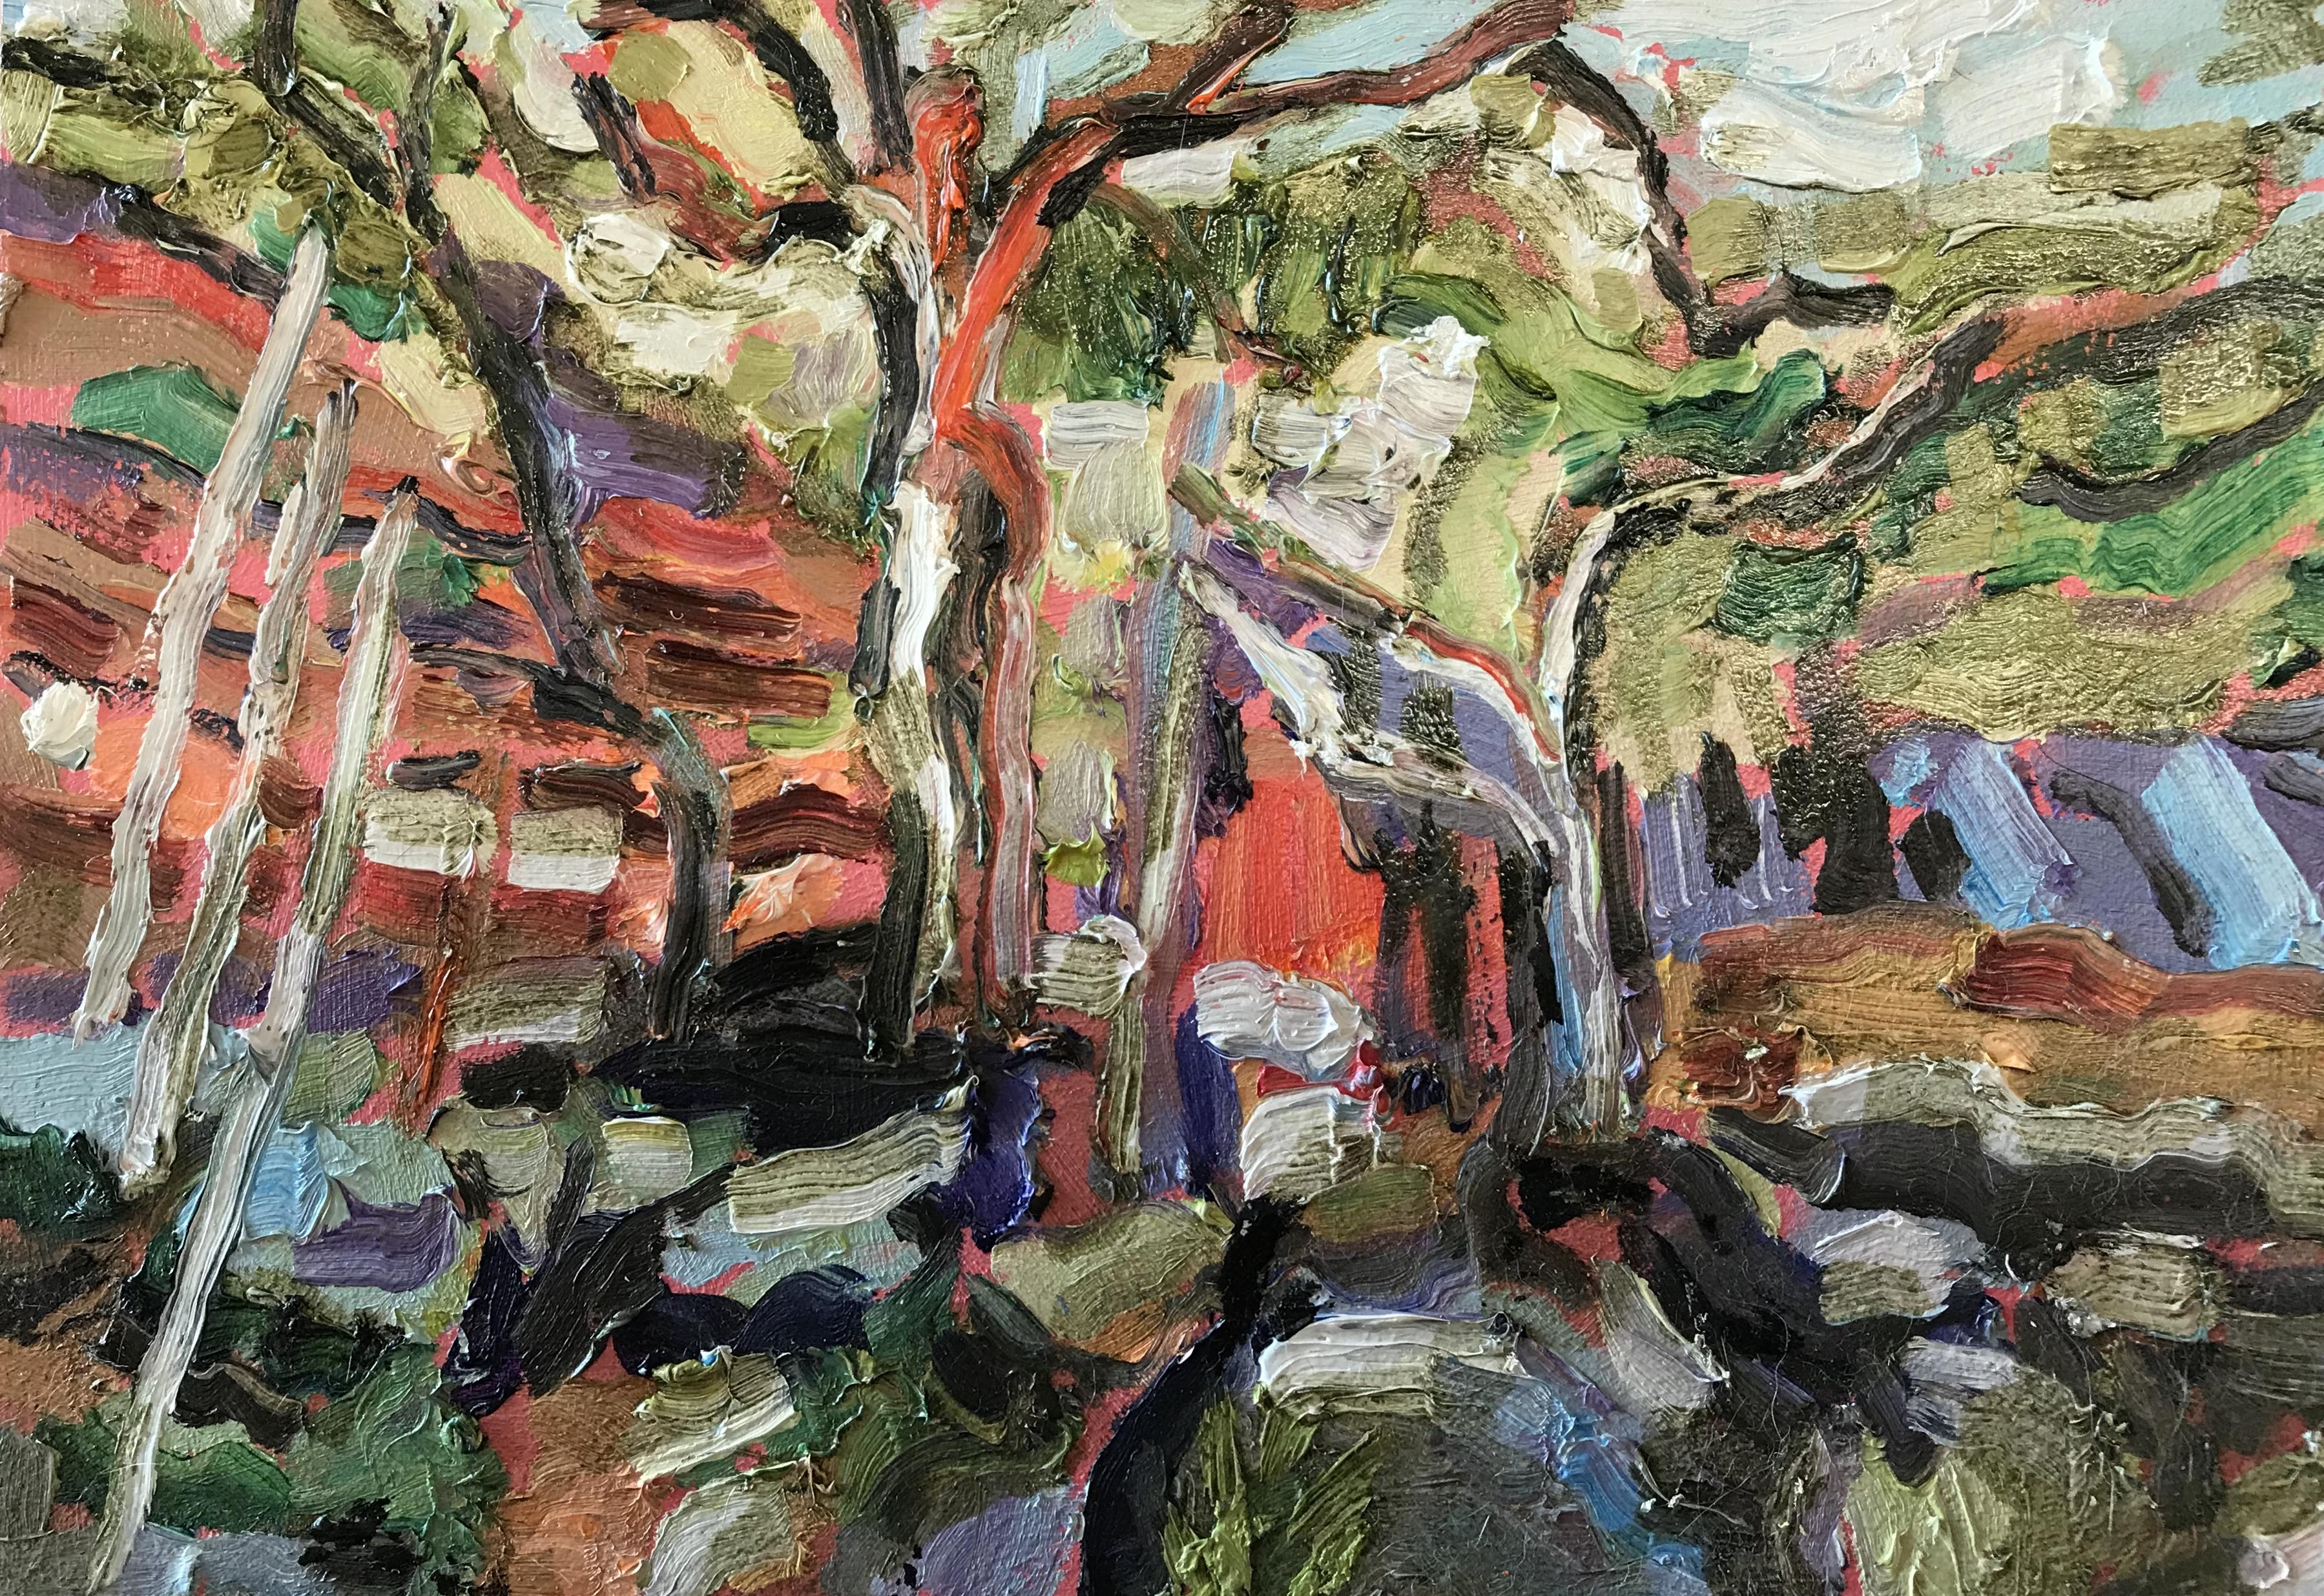 Goulburn River Gums, Study, 2018